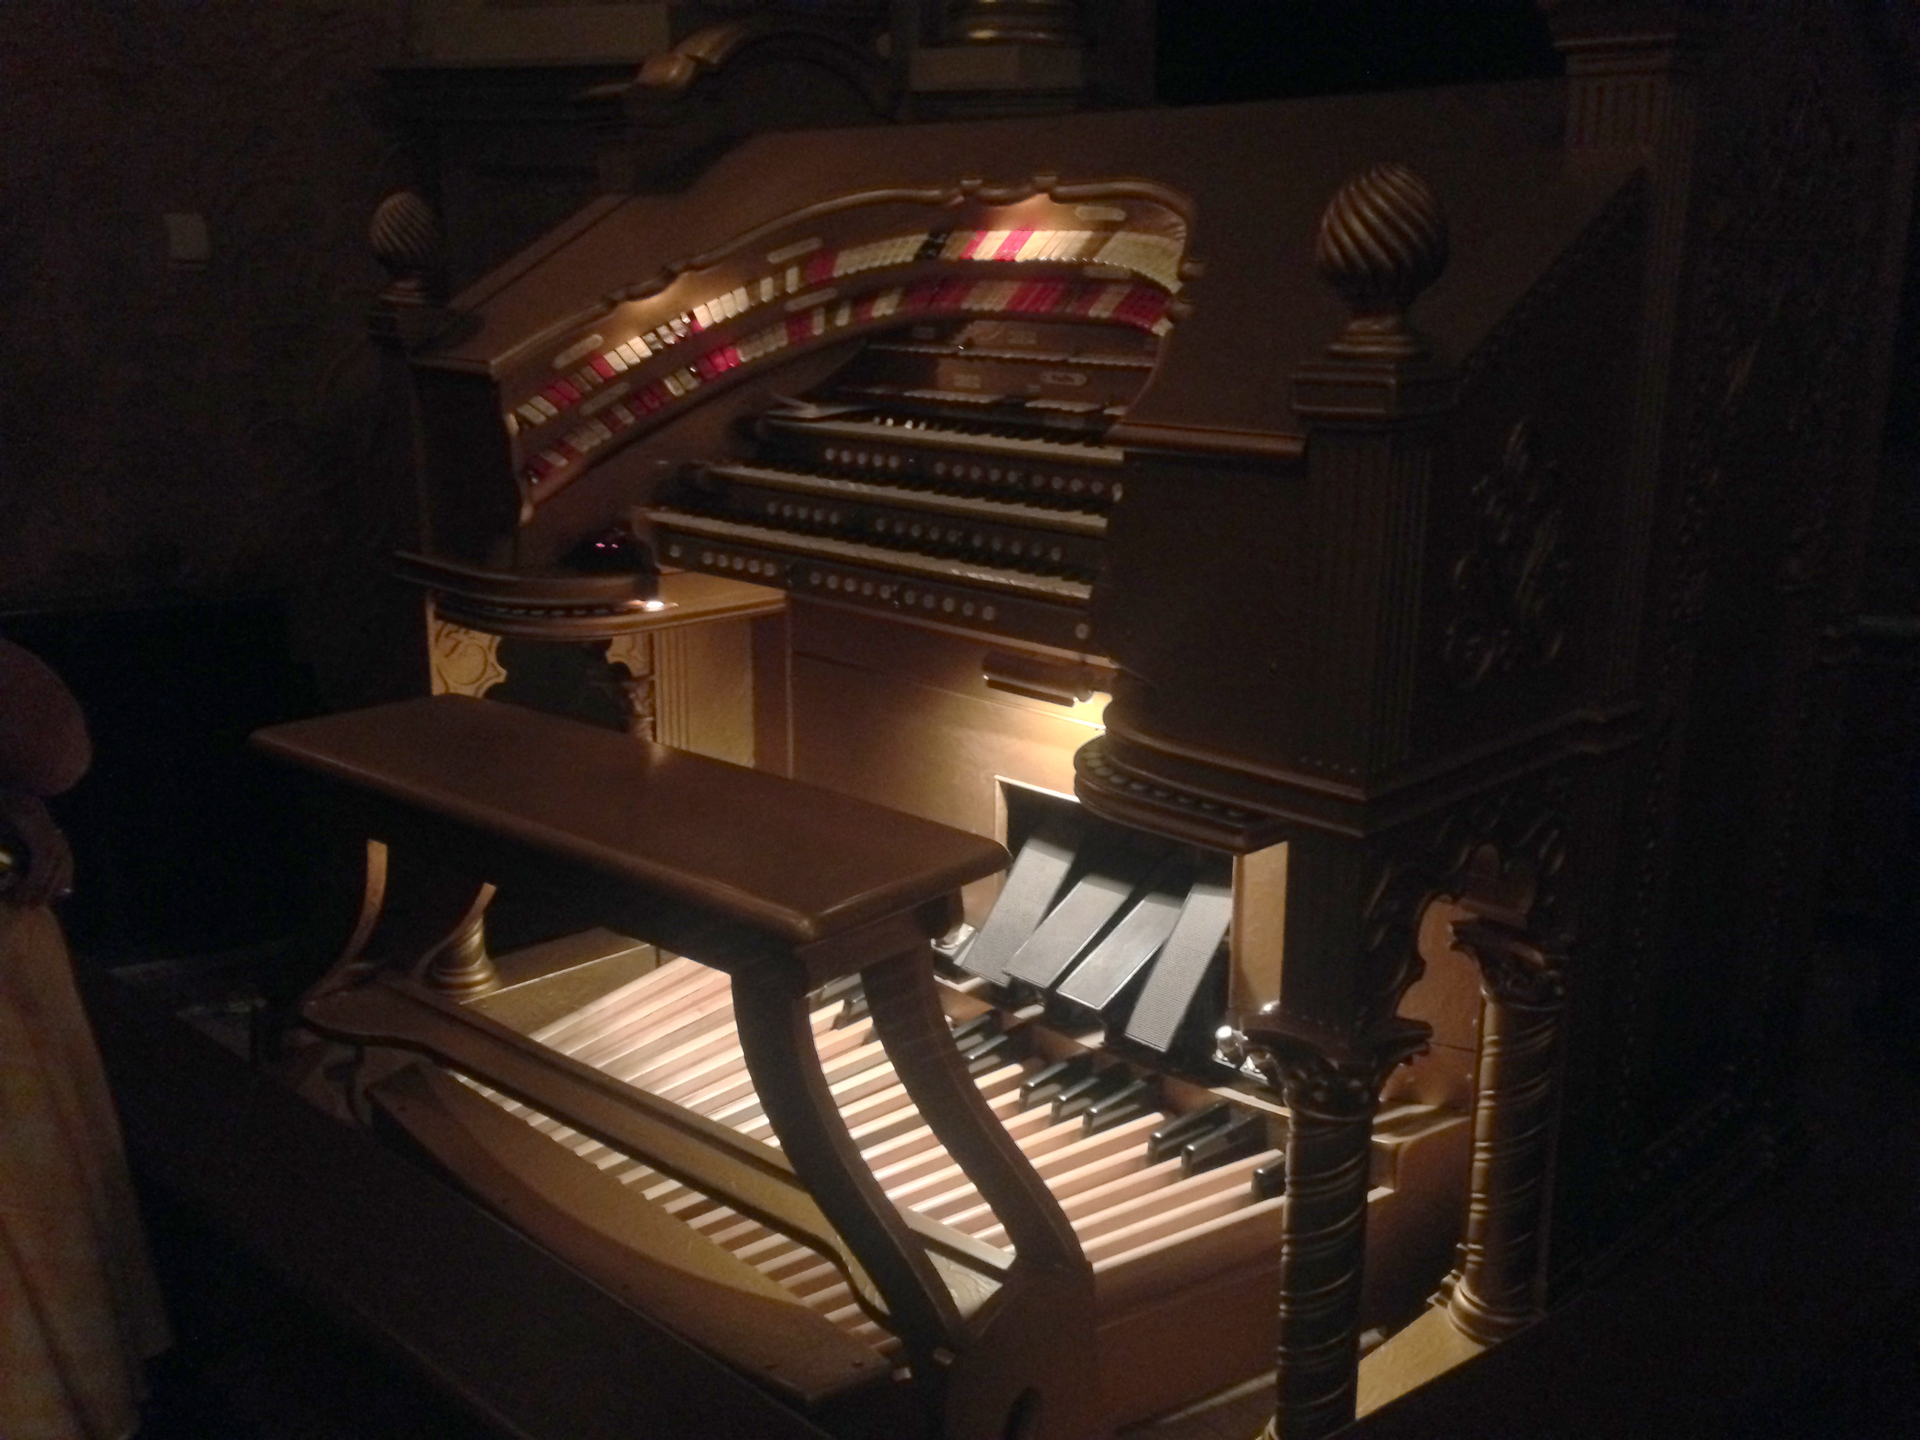 plaza-theater-gold-wurlitzer-organ